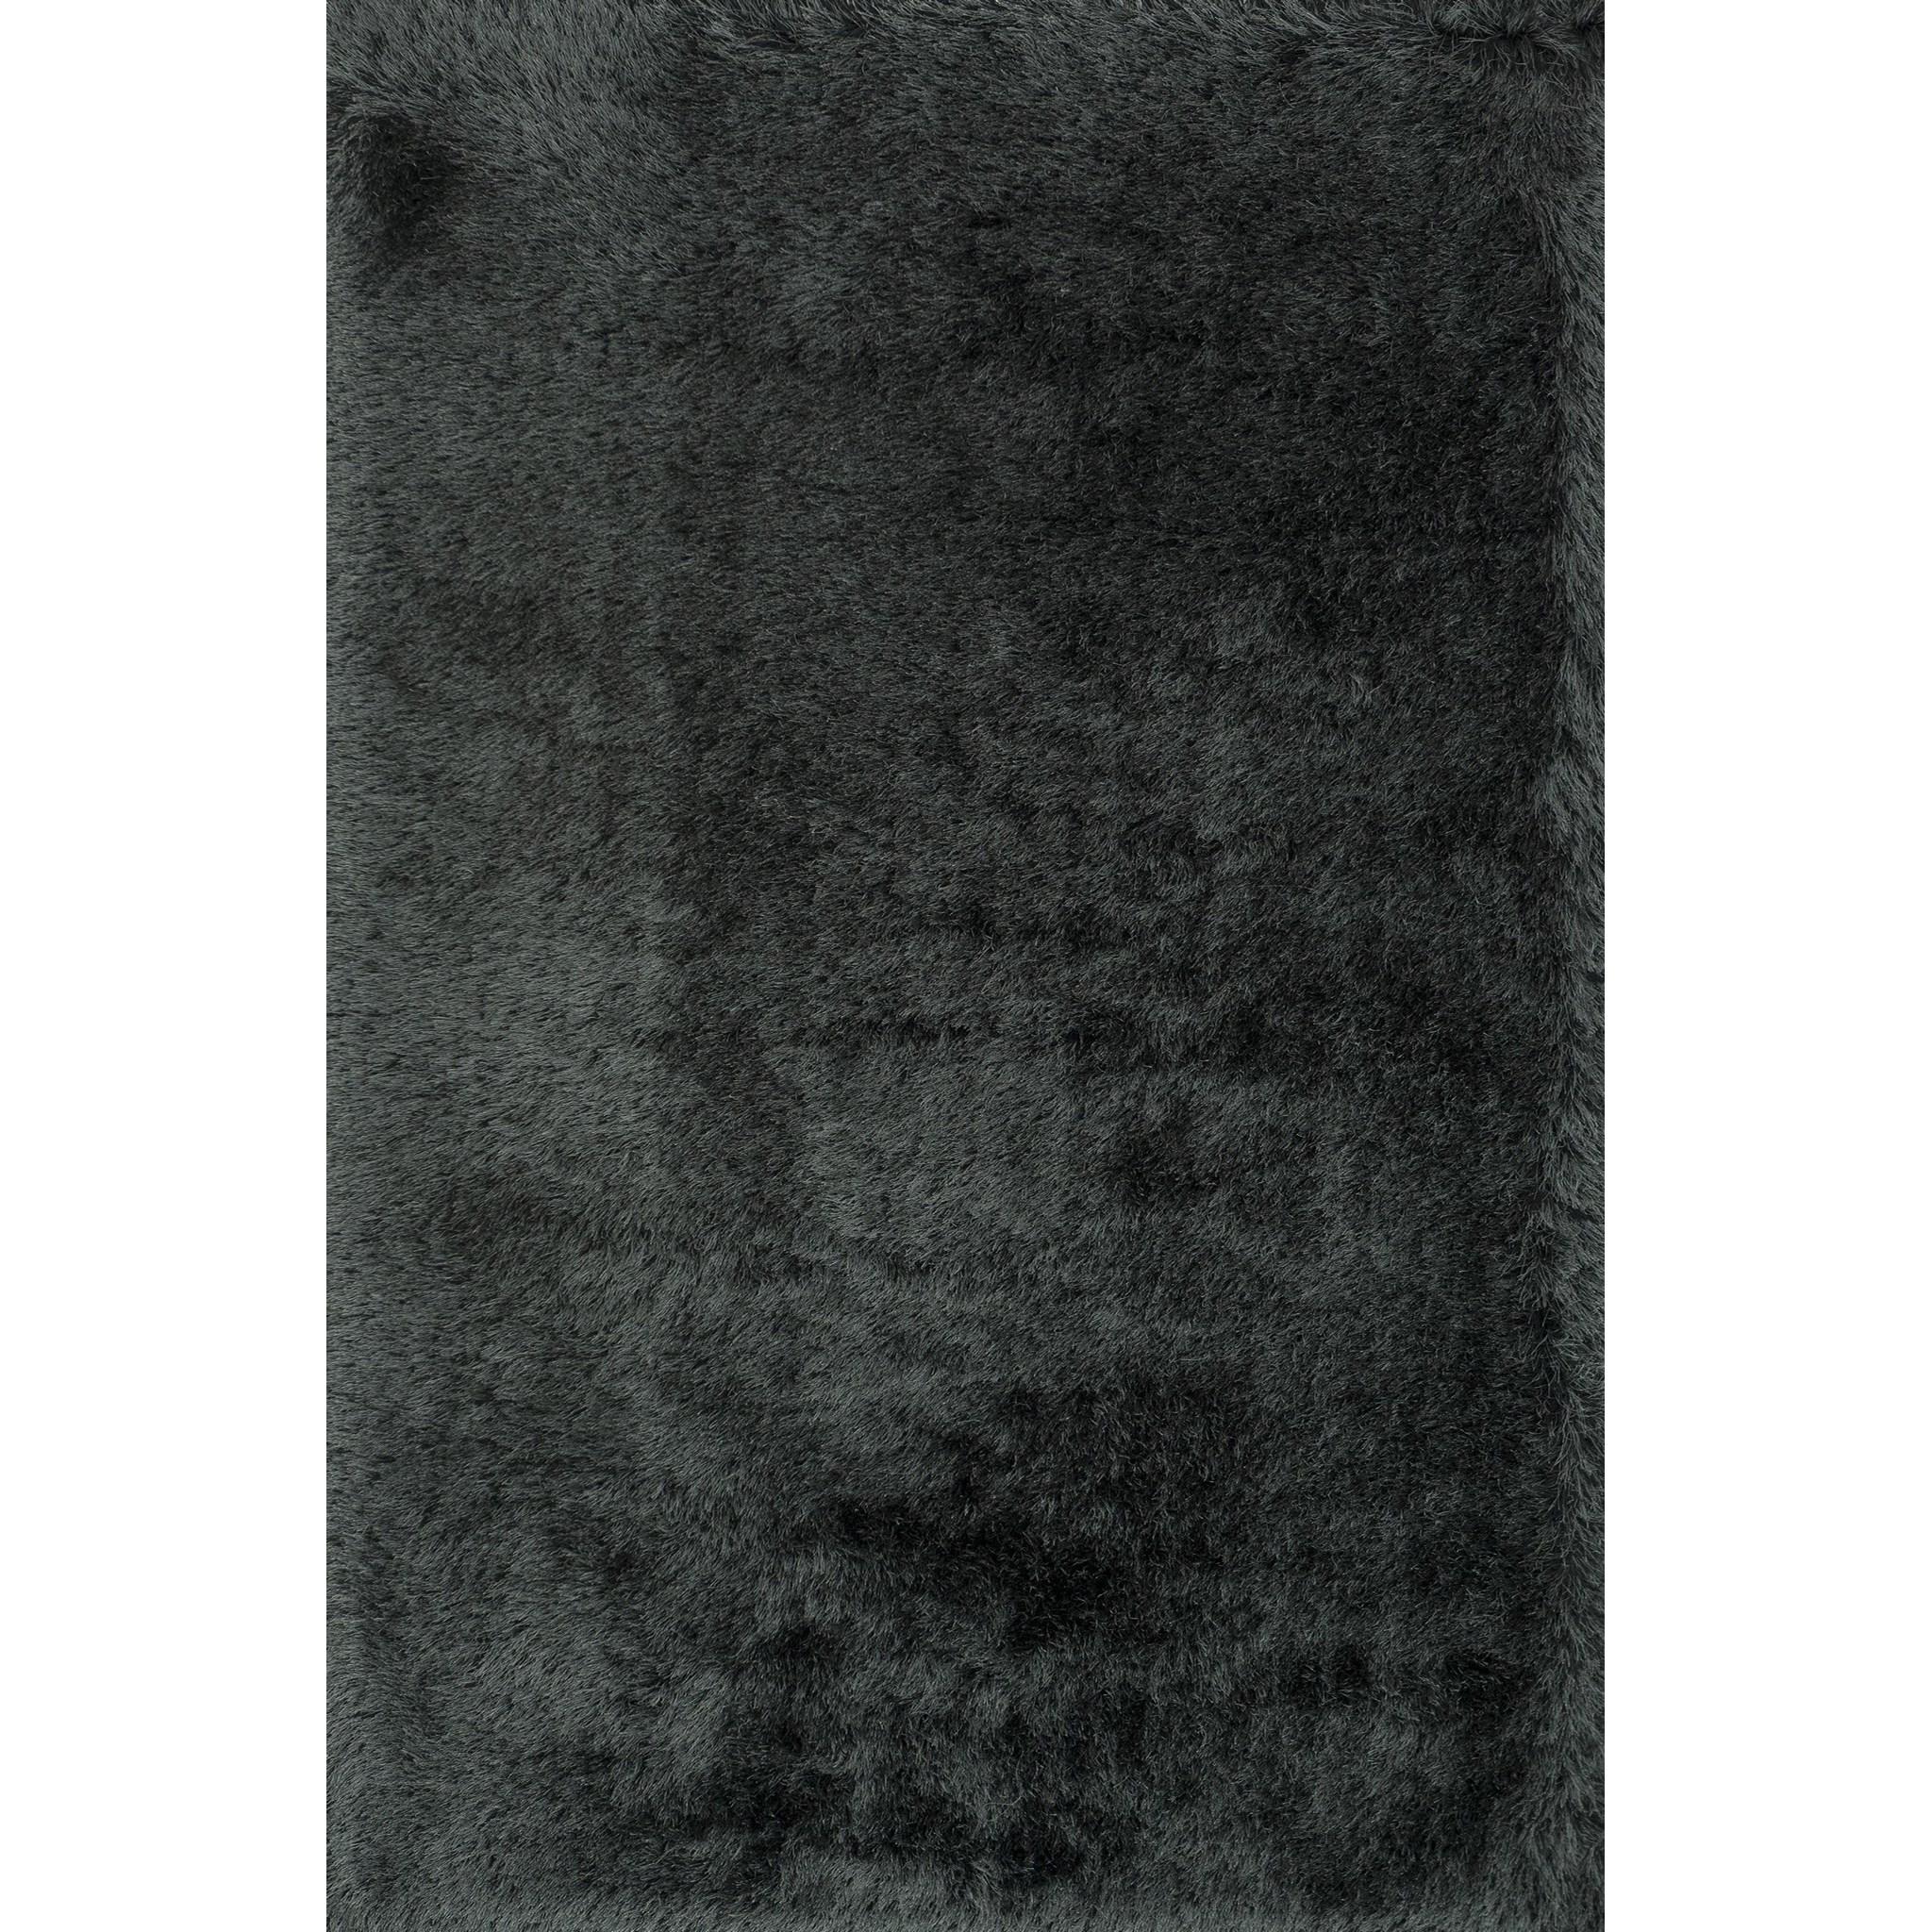 "Allure Shag 3'-6"" x 5'-6"" Area Rug by Loloi Rugs at Pedigo Furniture"